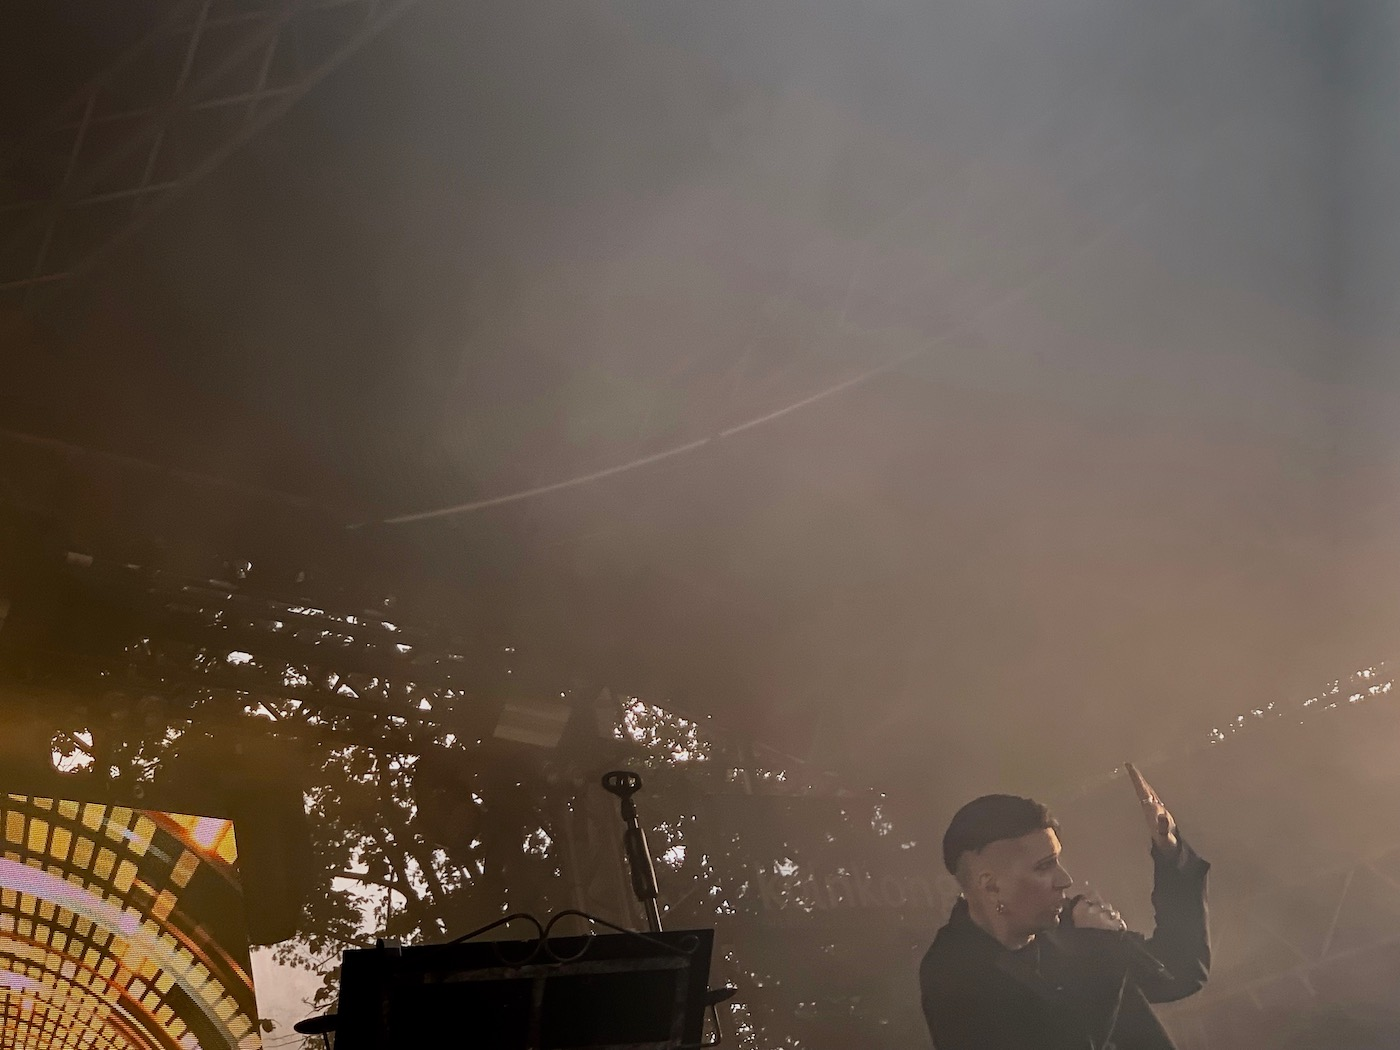 mark_benecke_amphi_festival_koeln_2019 - 90.jpg